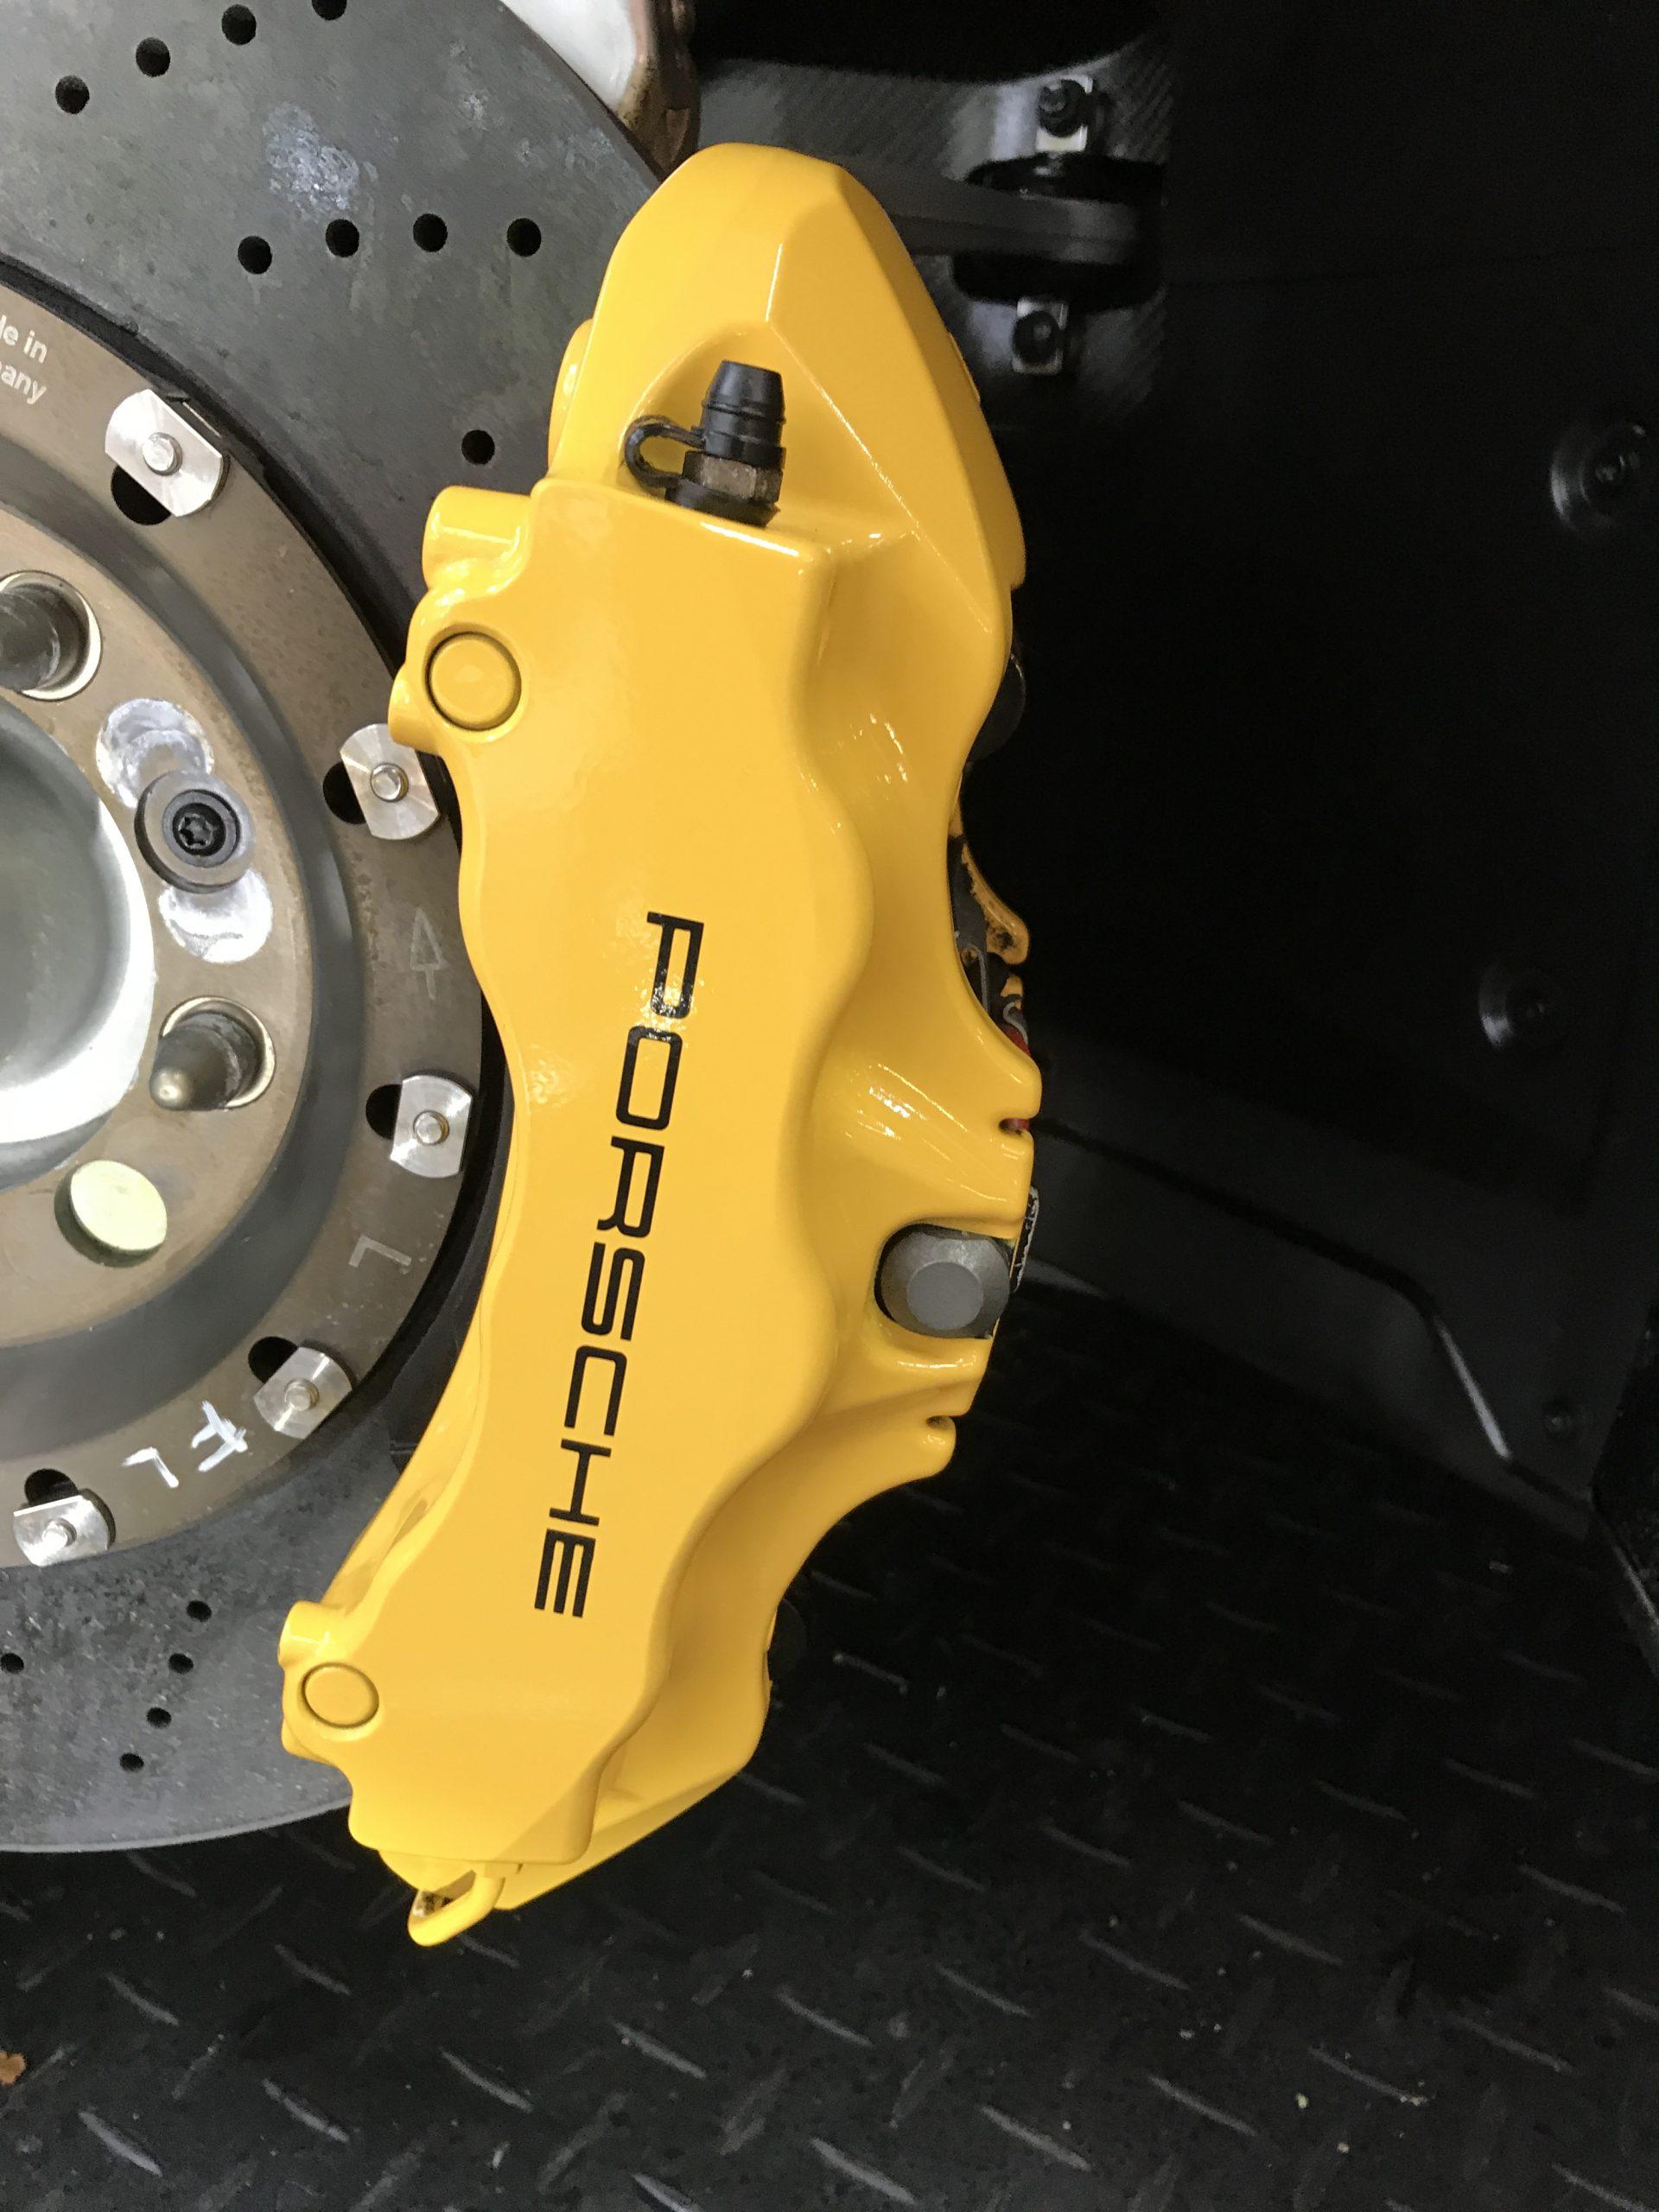 Porsche brake callipers detailing